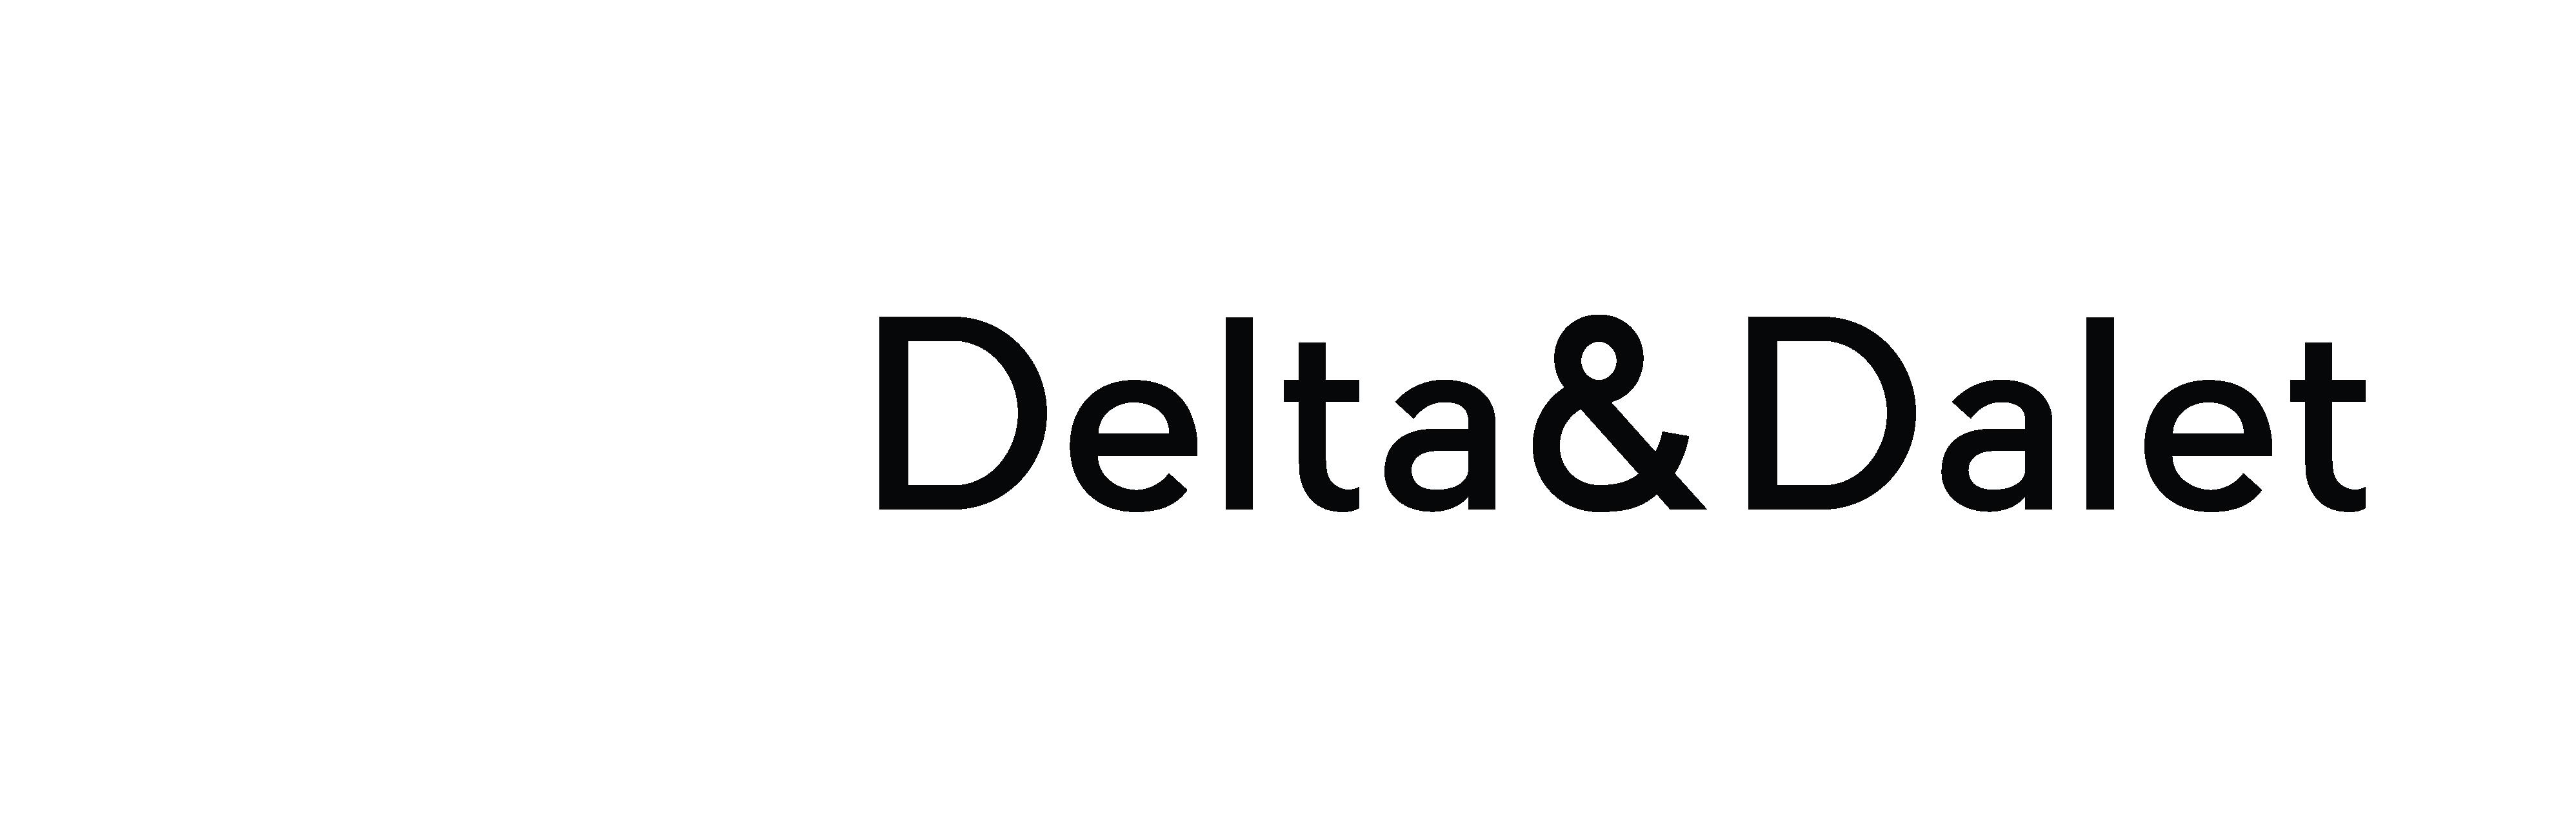 Delta e Dalet